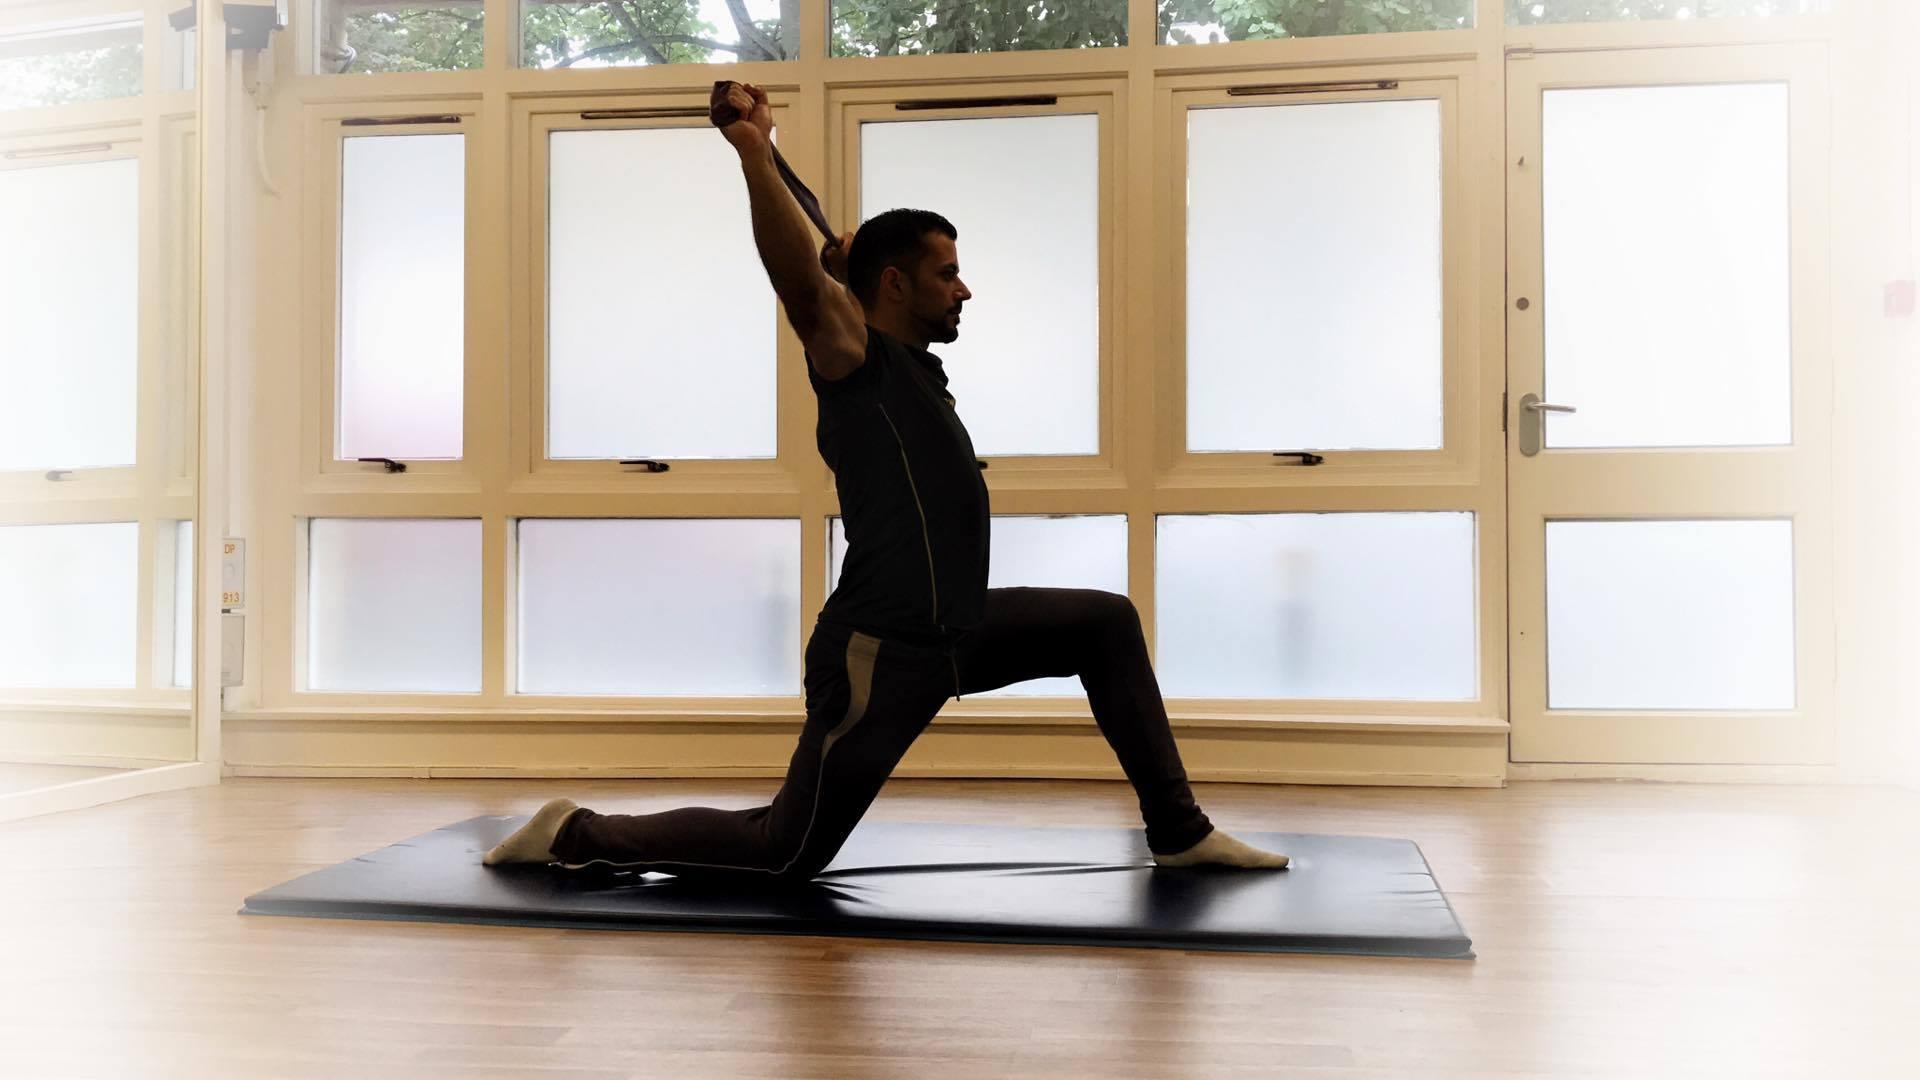 Pilates Mat Class with Daz Bokhari - Sunday 15th April 4.30-5.30pm